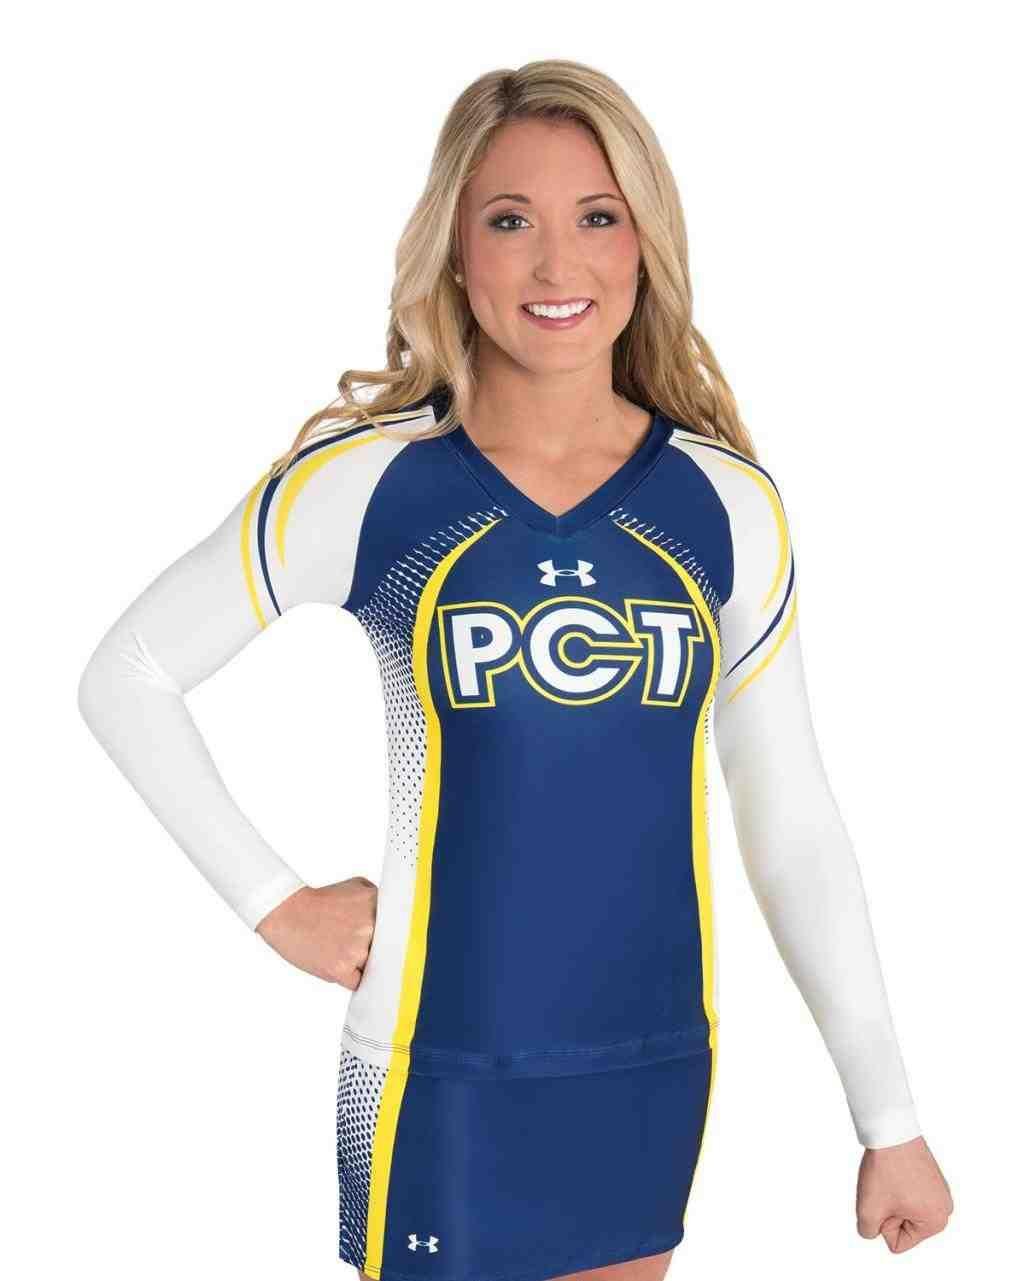 Long Sleeve Cheerleading Uniforms  sc 1 st  Pinterest & Long Sleeve Cheerleading Uniforms | Better Cheerleading Uniforms 1 ...